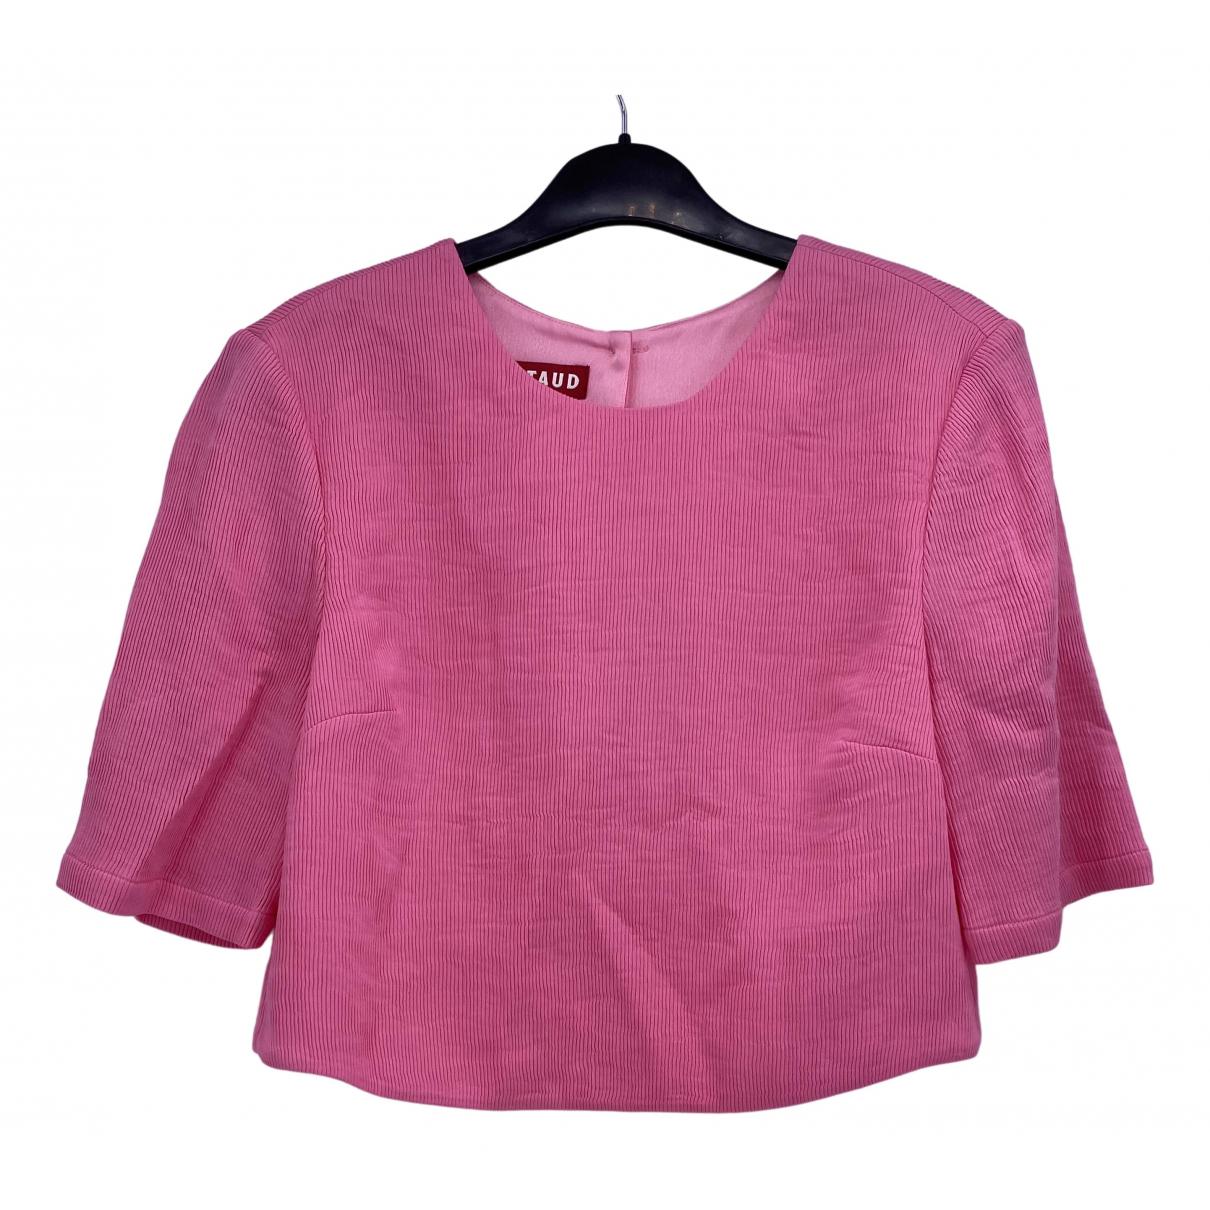 Staud - Top   pour femme - rose